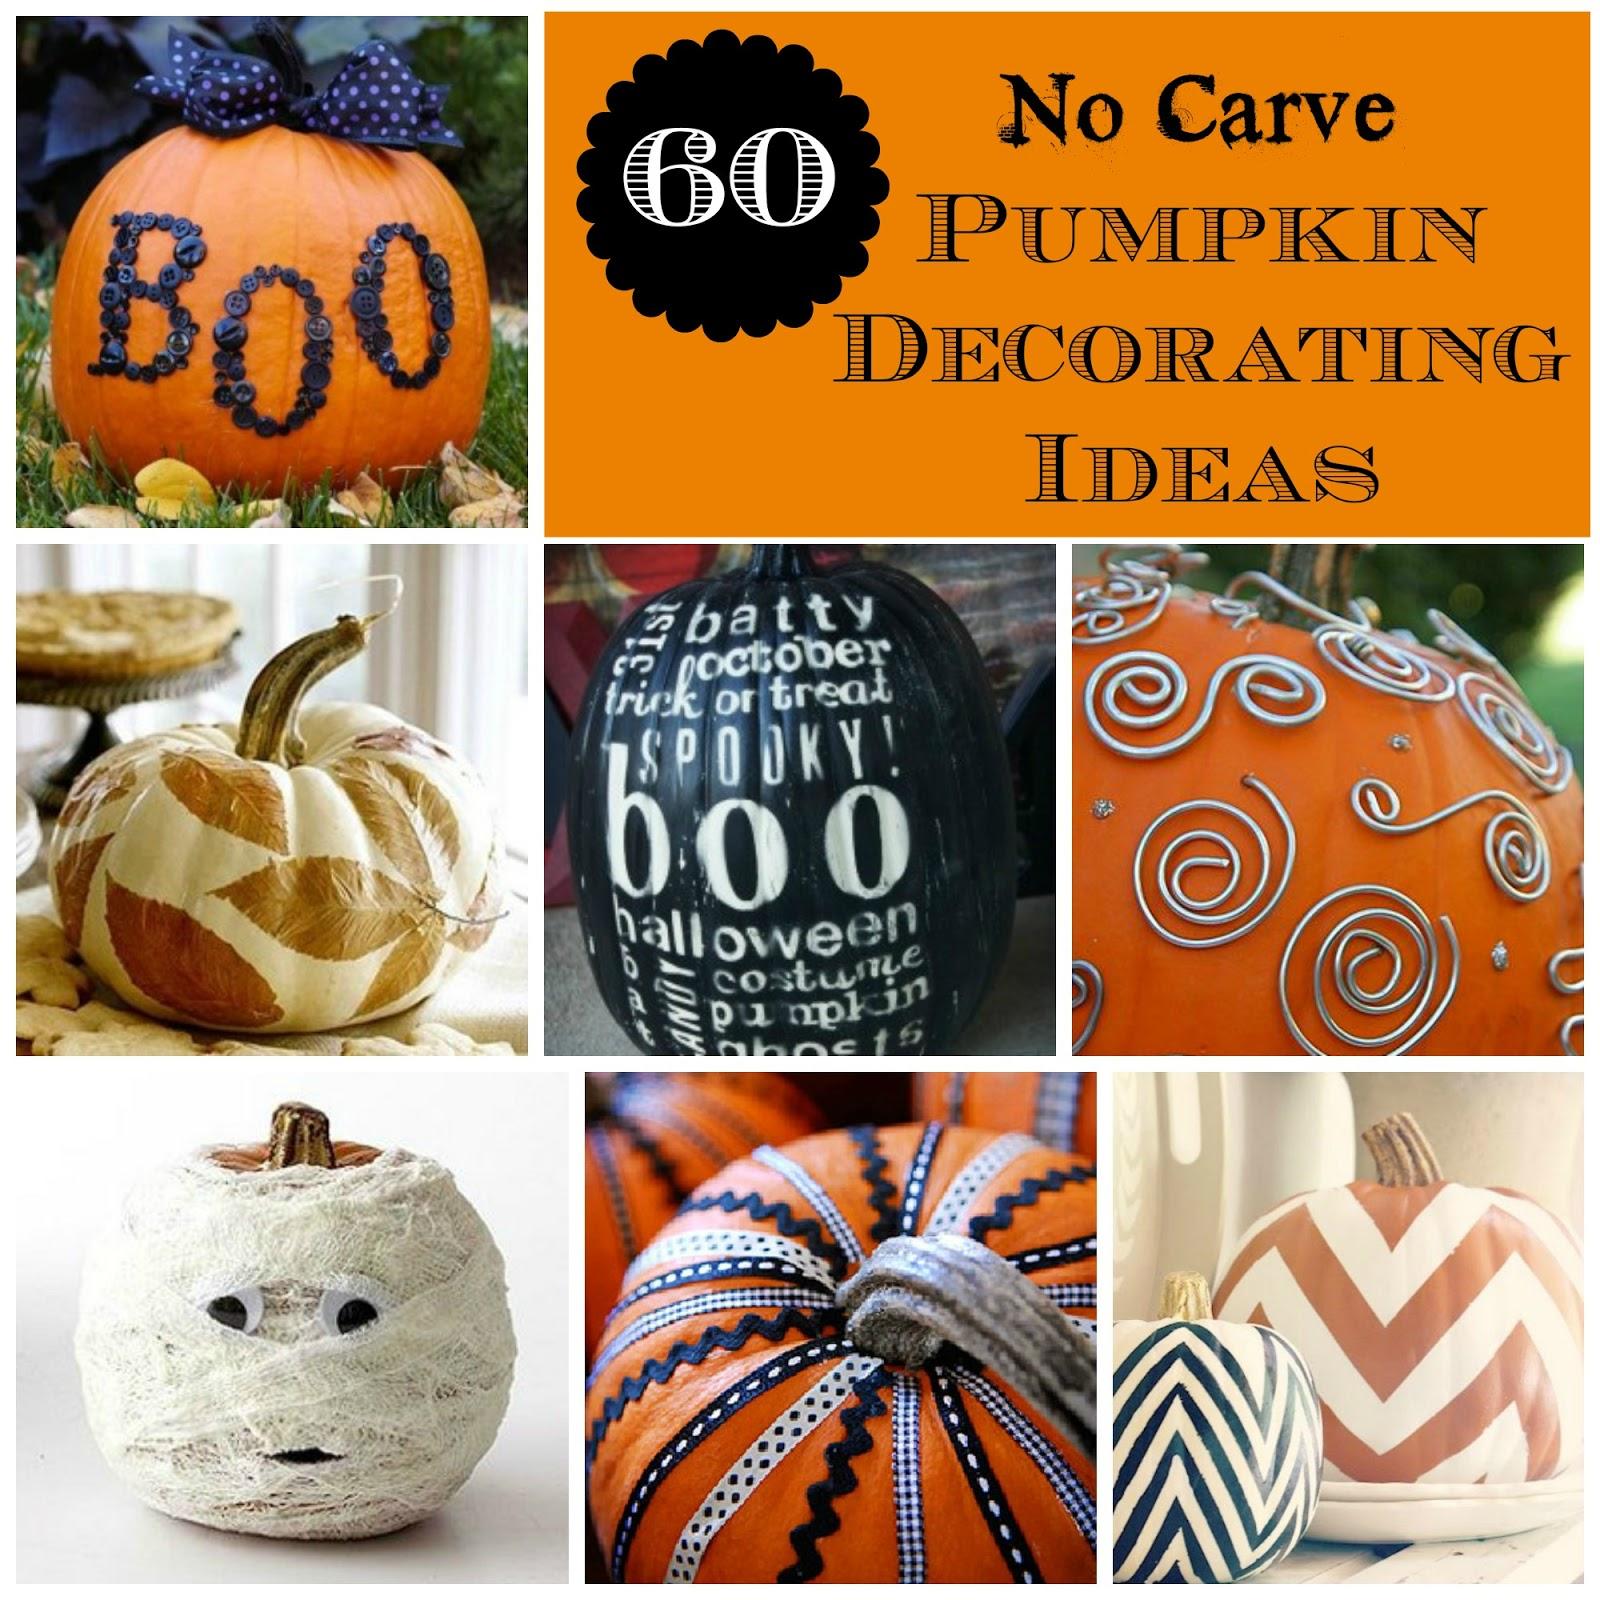 60 No Carve Pumpkin Decorating Ideas  sc 1 st  all things katie marie & all things katie marie: 60 No Carve Pumpkin Decorating Ideas